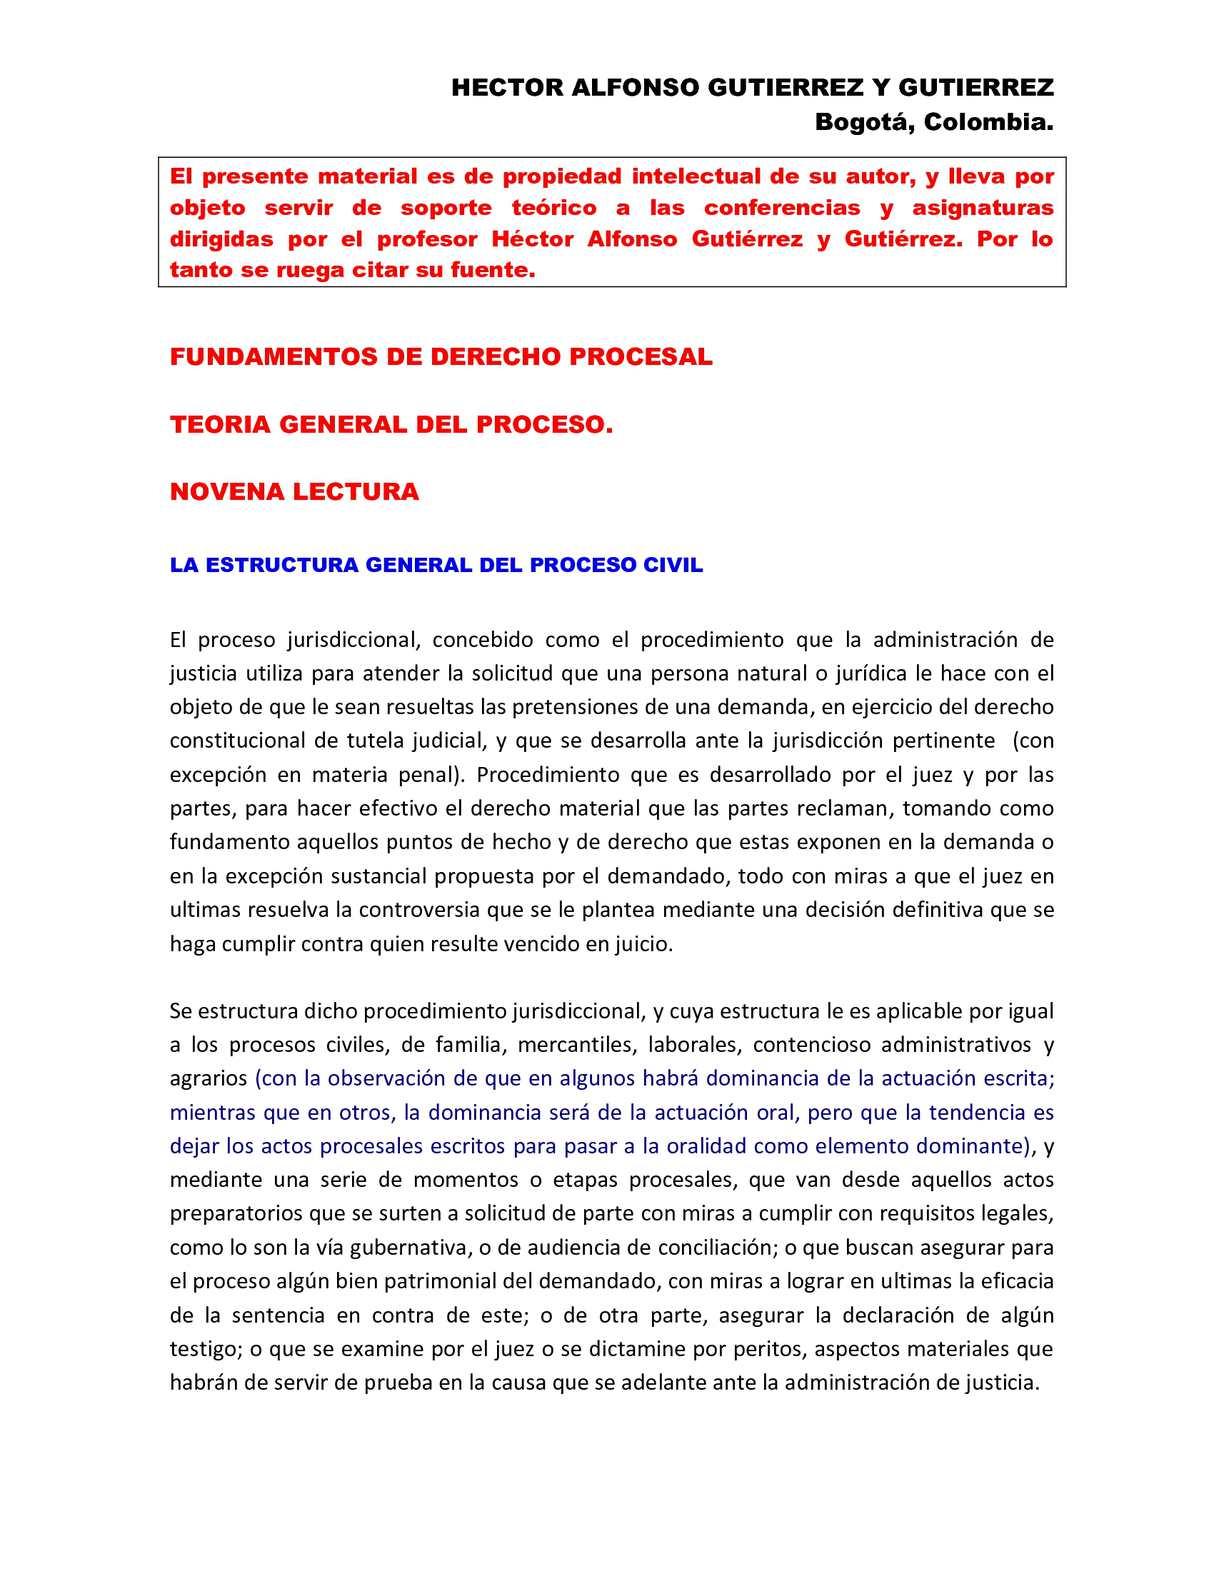 Calaméo - ESTRUCTURA GENERAL DEL PROCESO JURISDICCIONAL - COLOMBIA